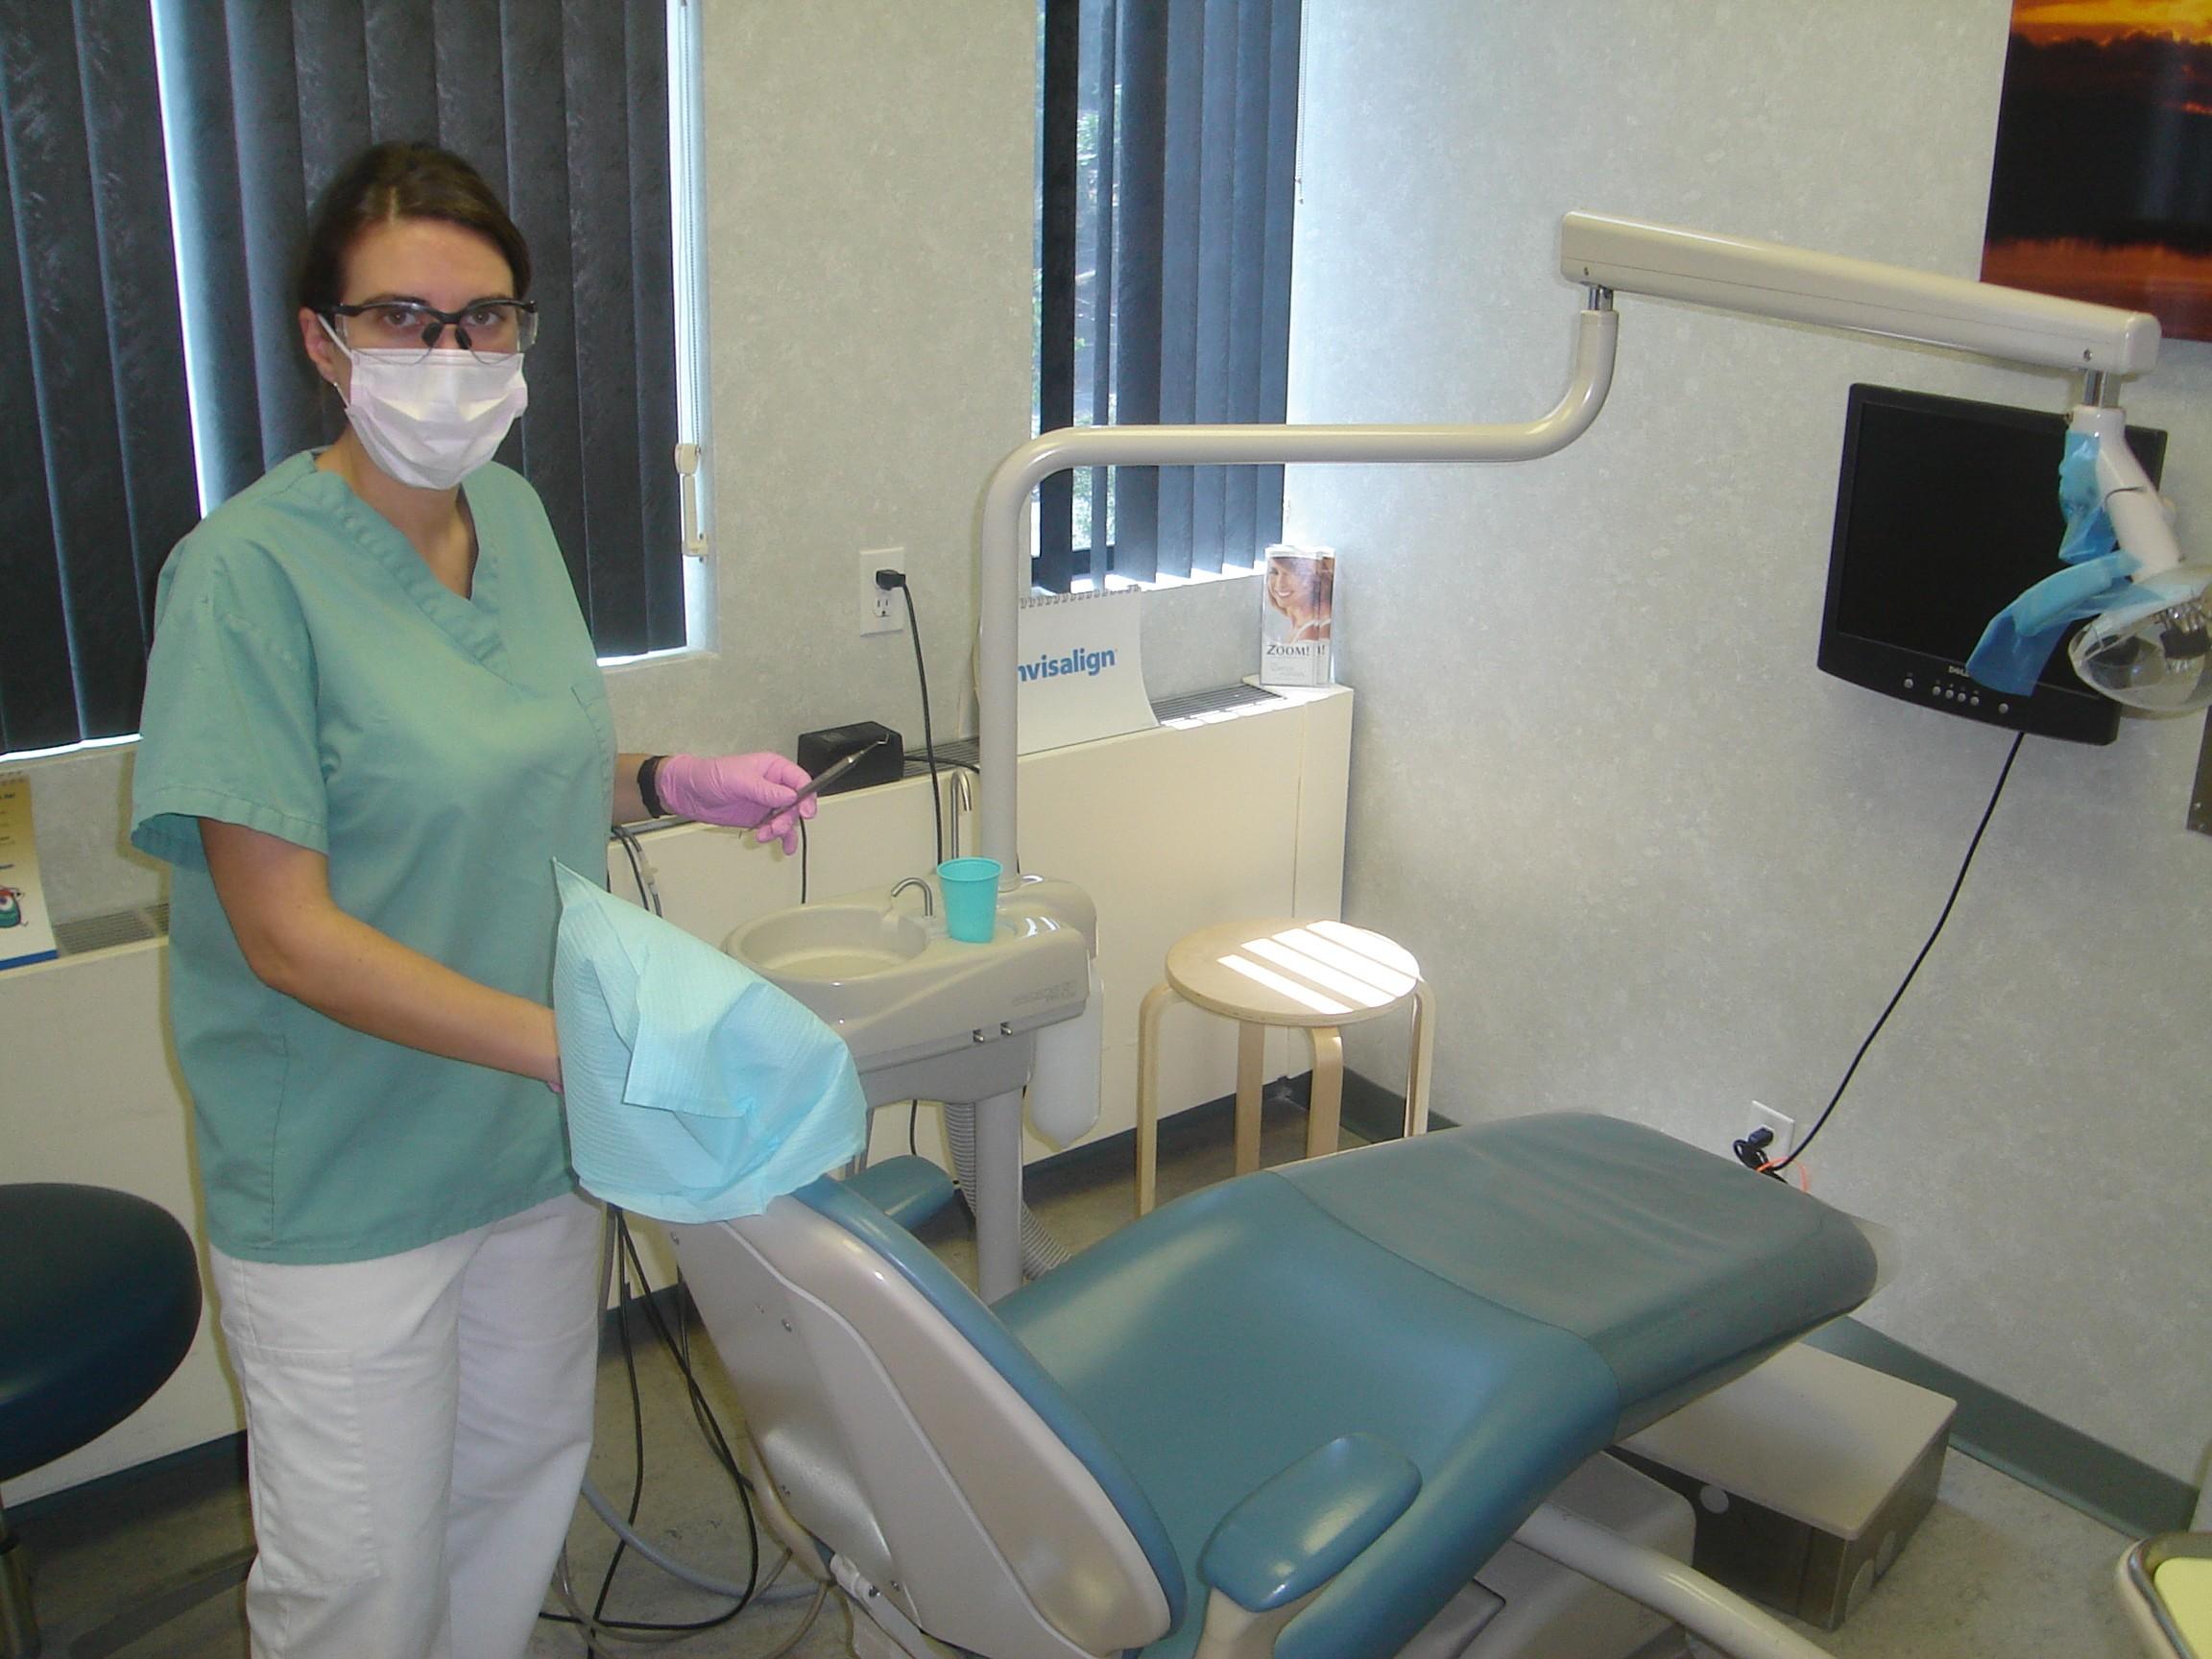 dental hygiene safety training atlantic training blog dental hygiene safety training